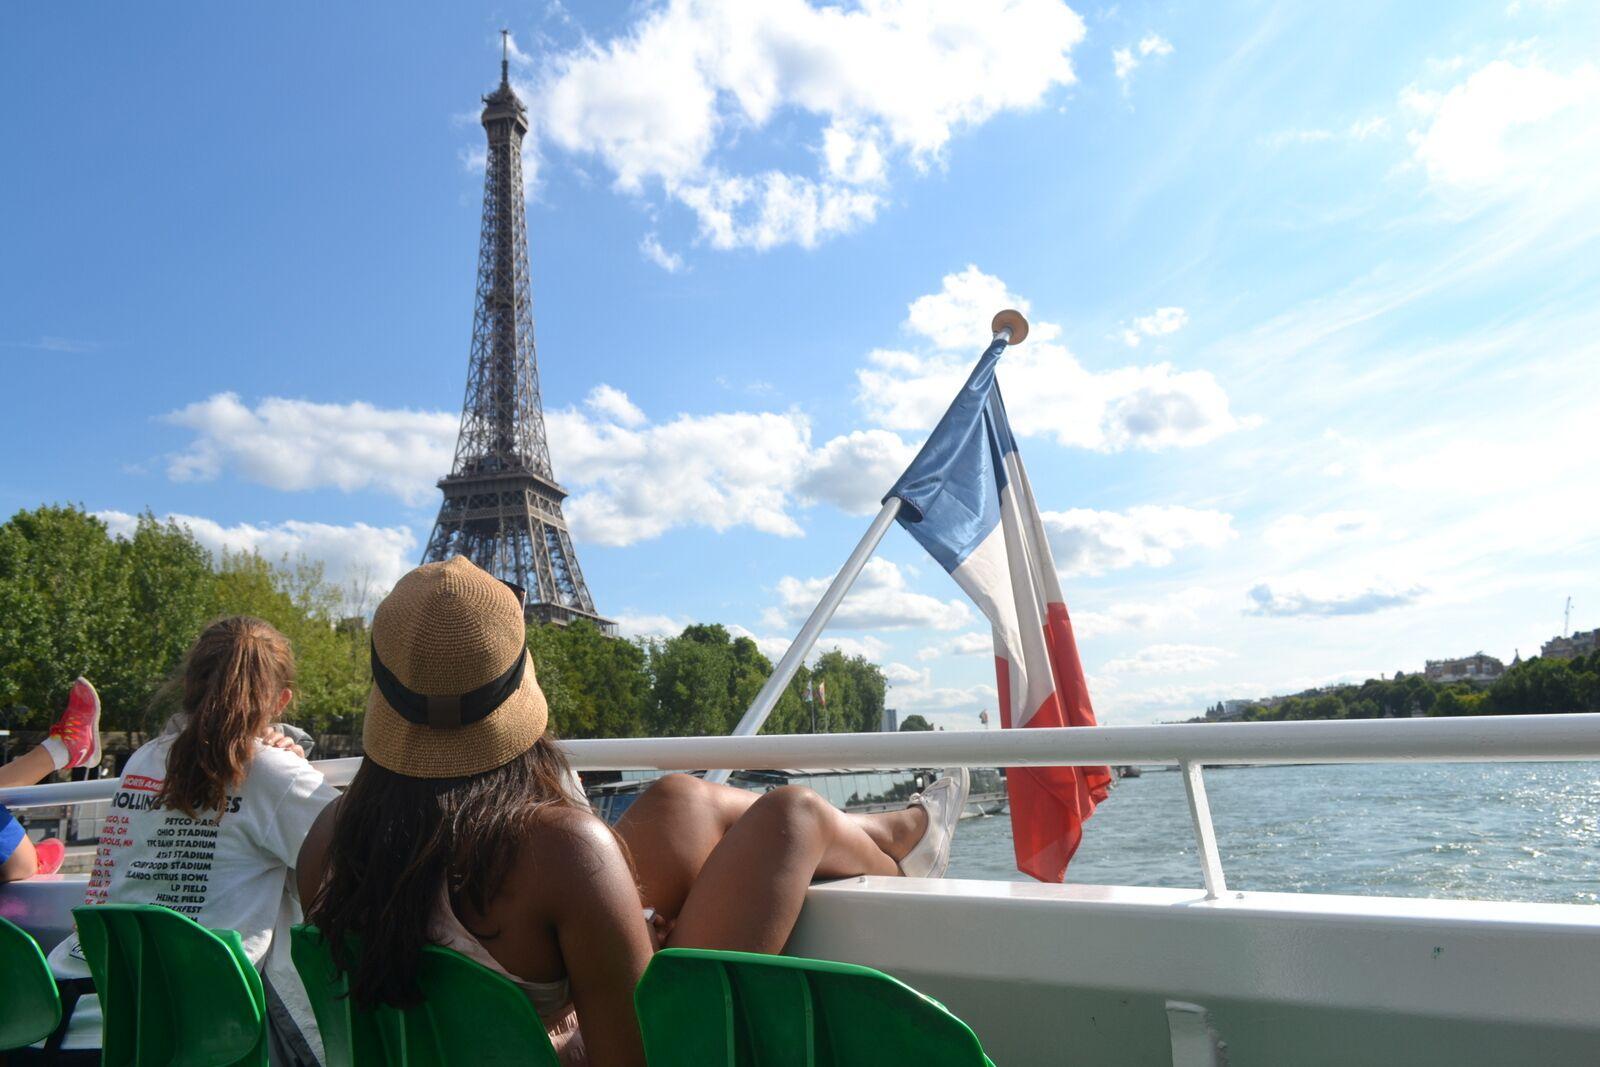 Summer Program - Adventure/Trips | Travel For Teens: Berlin, Paris, and London